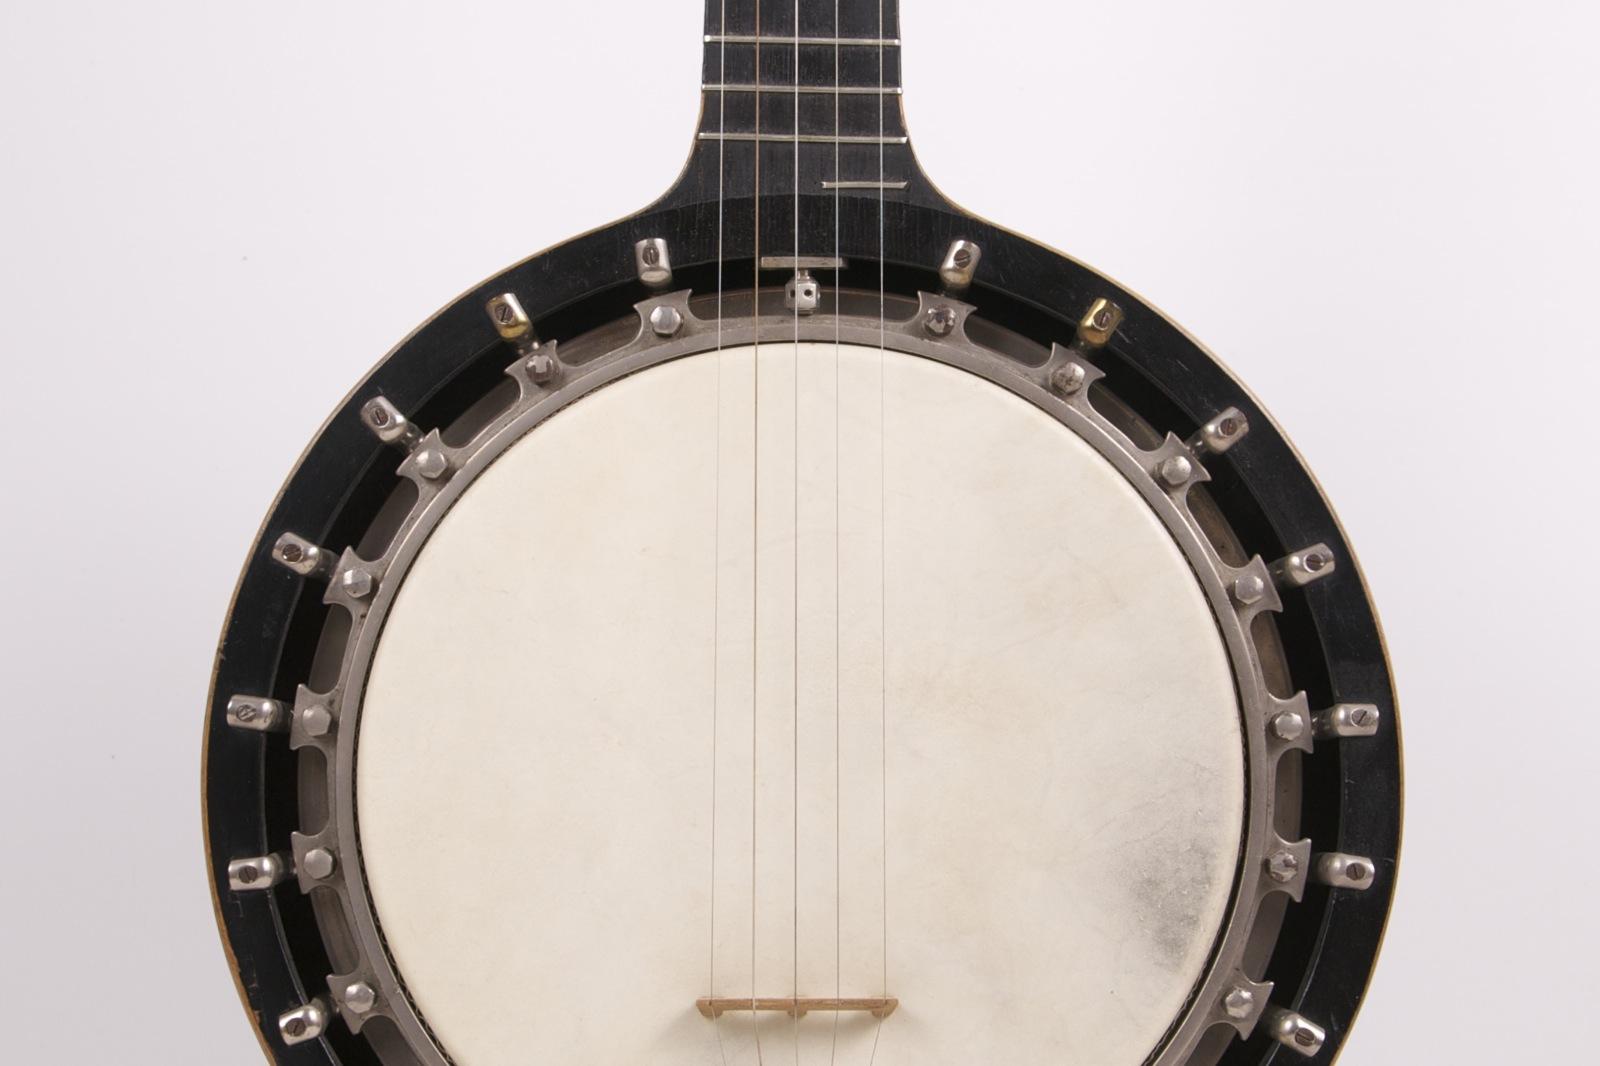 1873-banjo-Barnes-Mullins-4